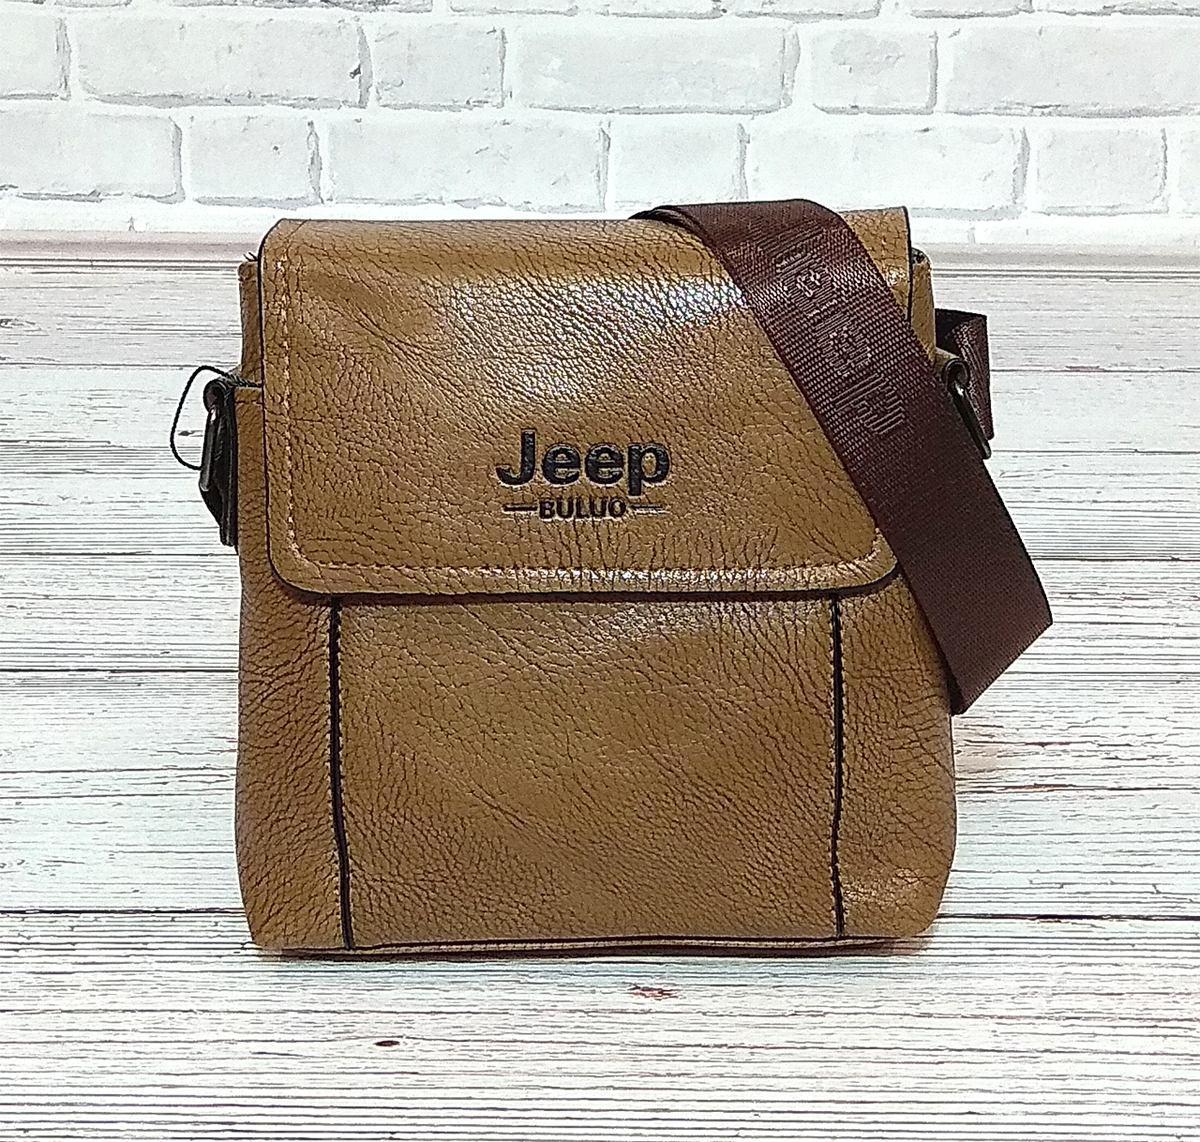 Мужская сумка через плечо Jeep. Коричневая. 21см х 19см / Кожа PU. 5541 brown